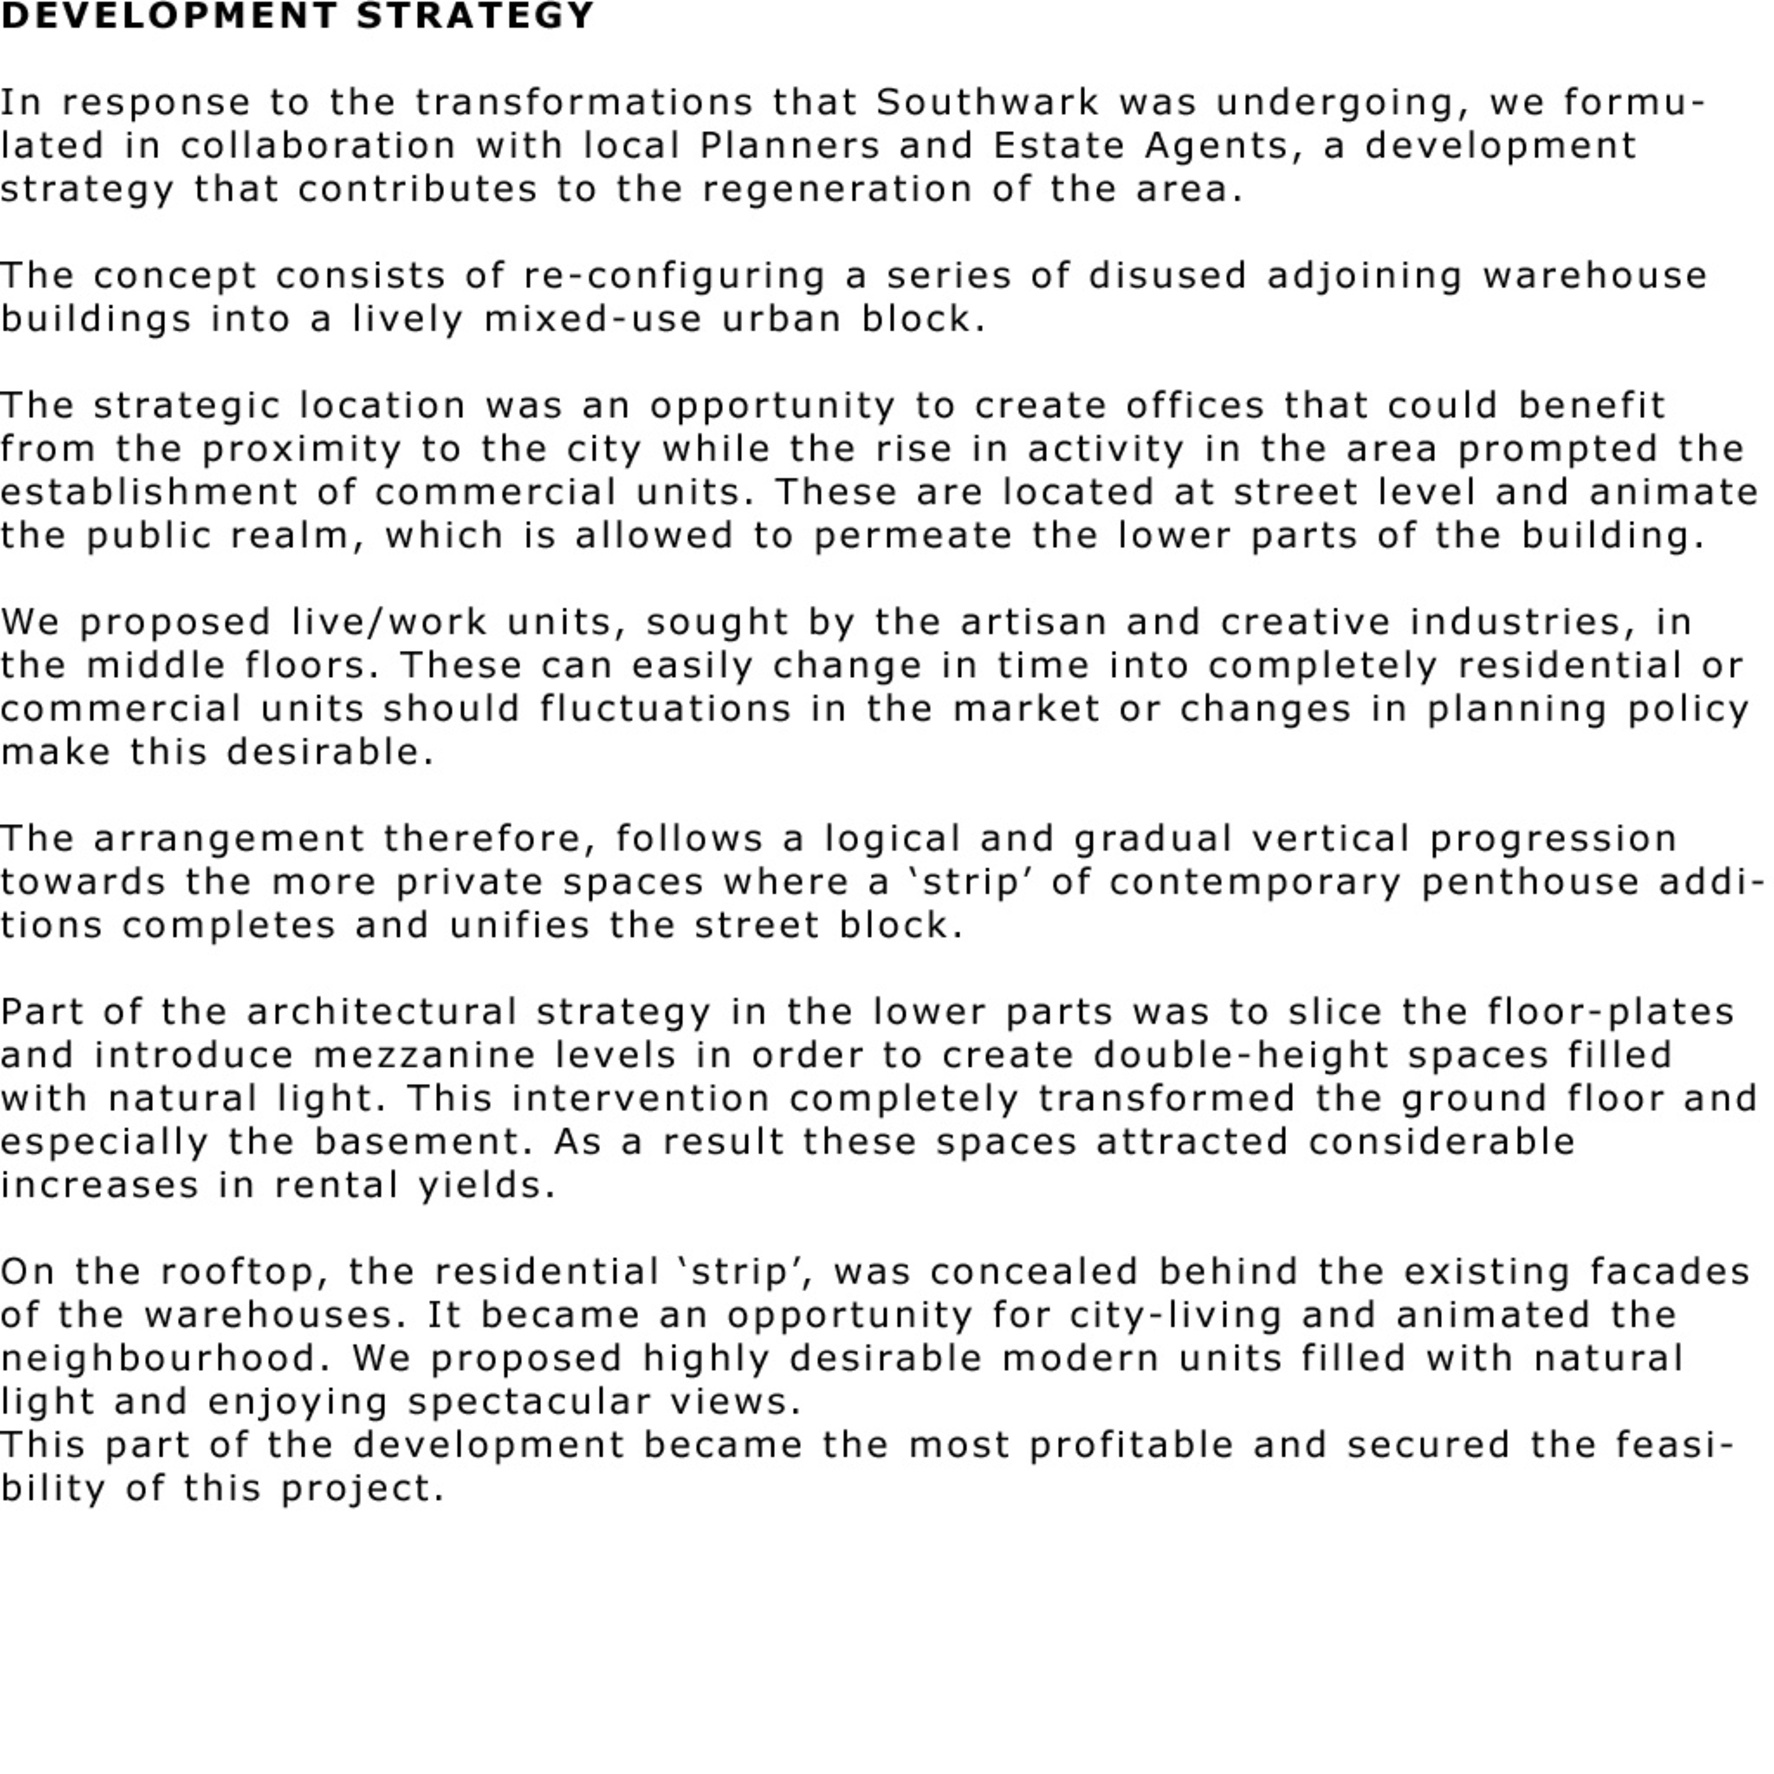 DEVELOPMENT STRATEGY - SOUTHWARK